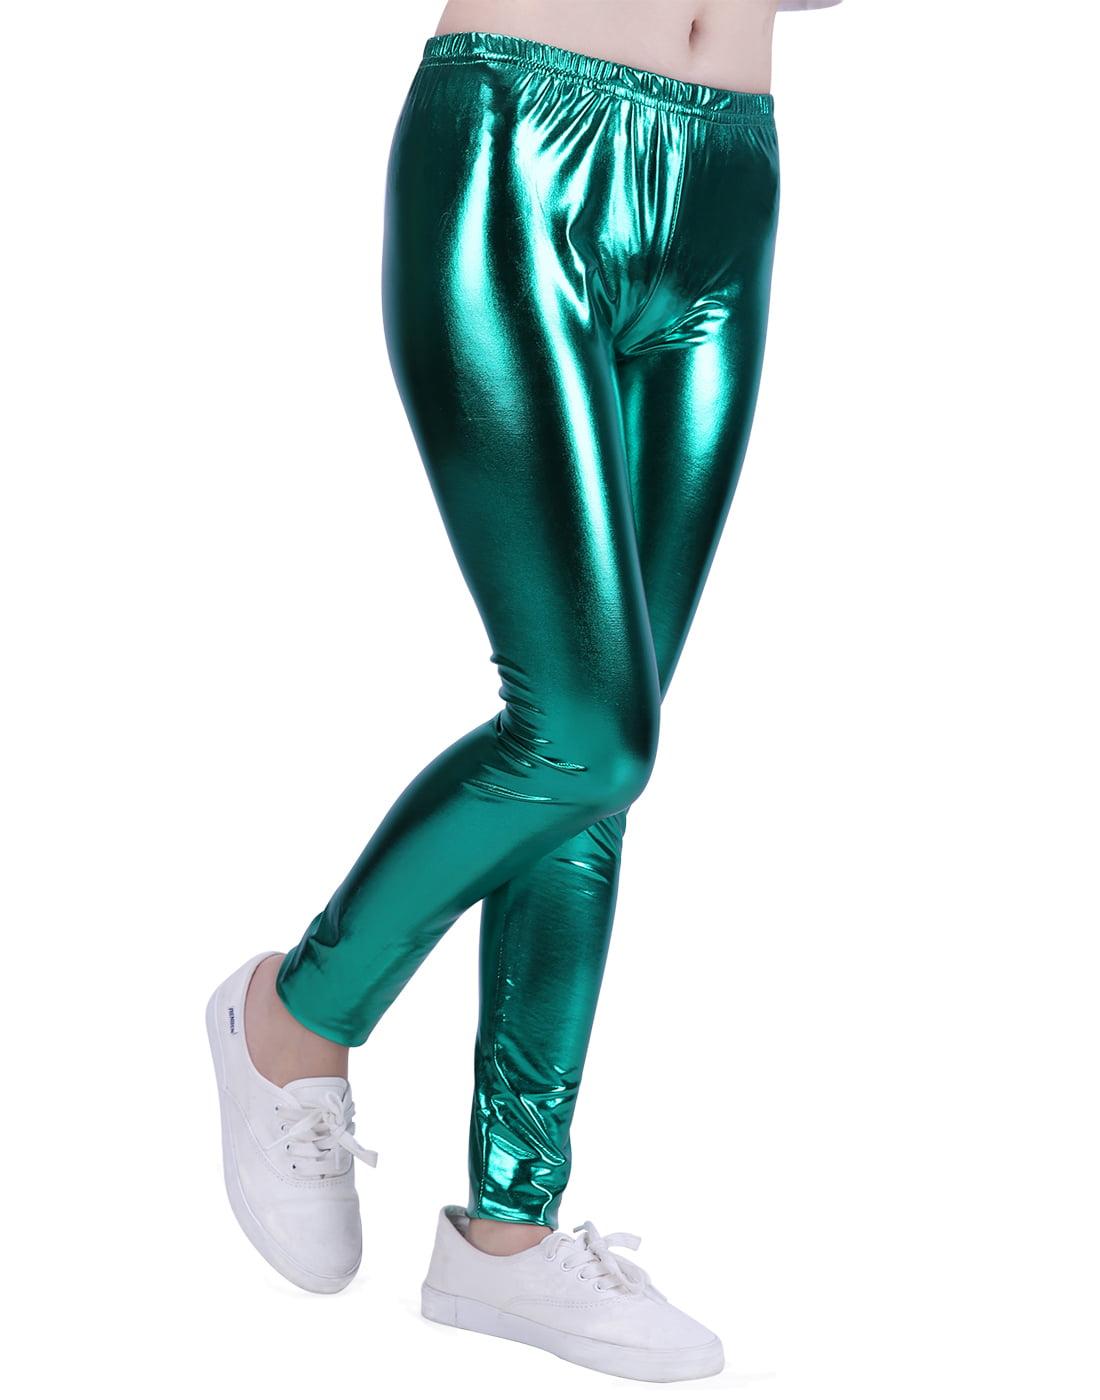 HDE Girls Shiny Wet Look Leggings Kids Liquid Metallic Footless Tights (Silver, 4/5)